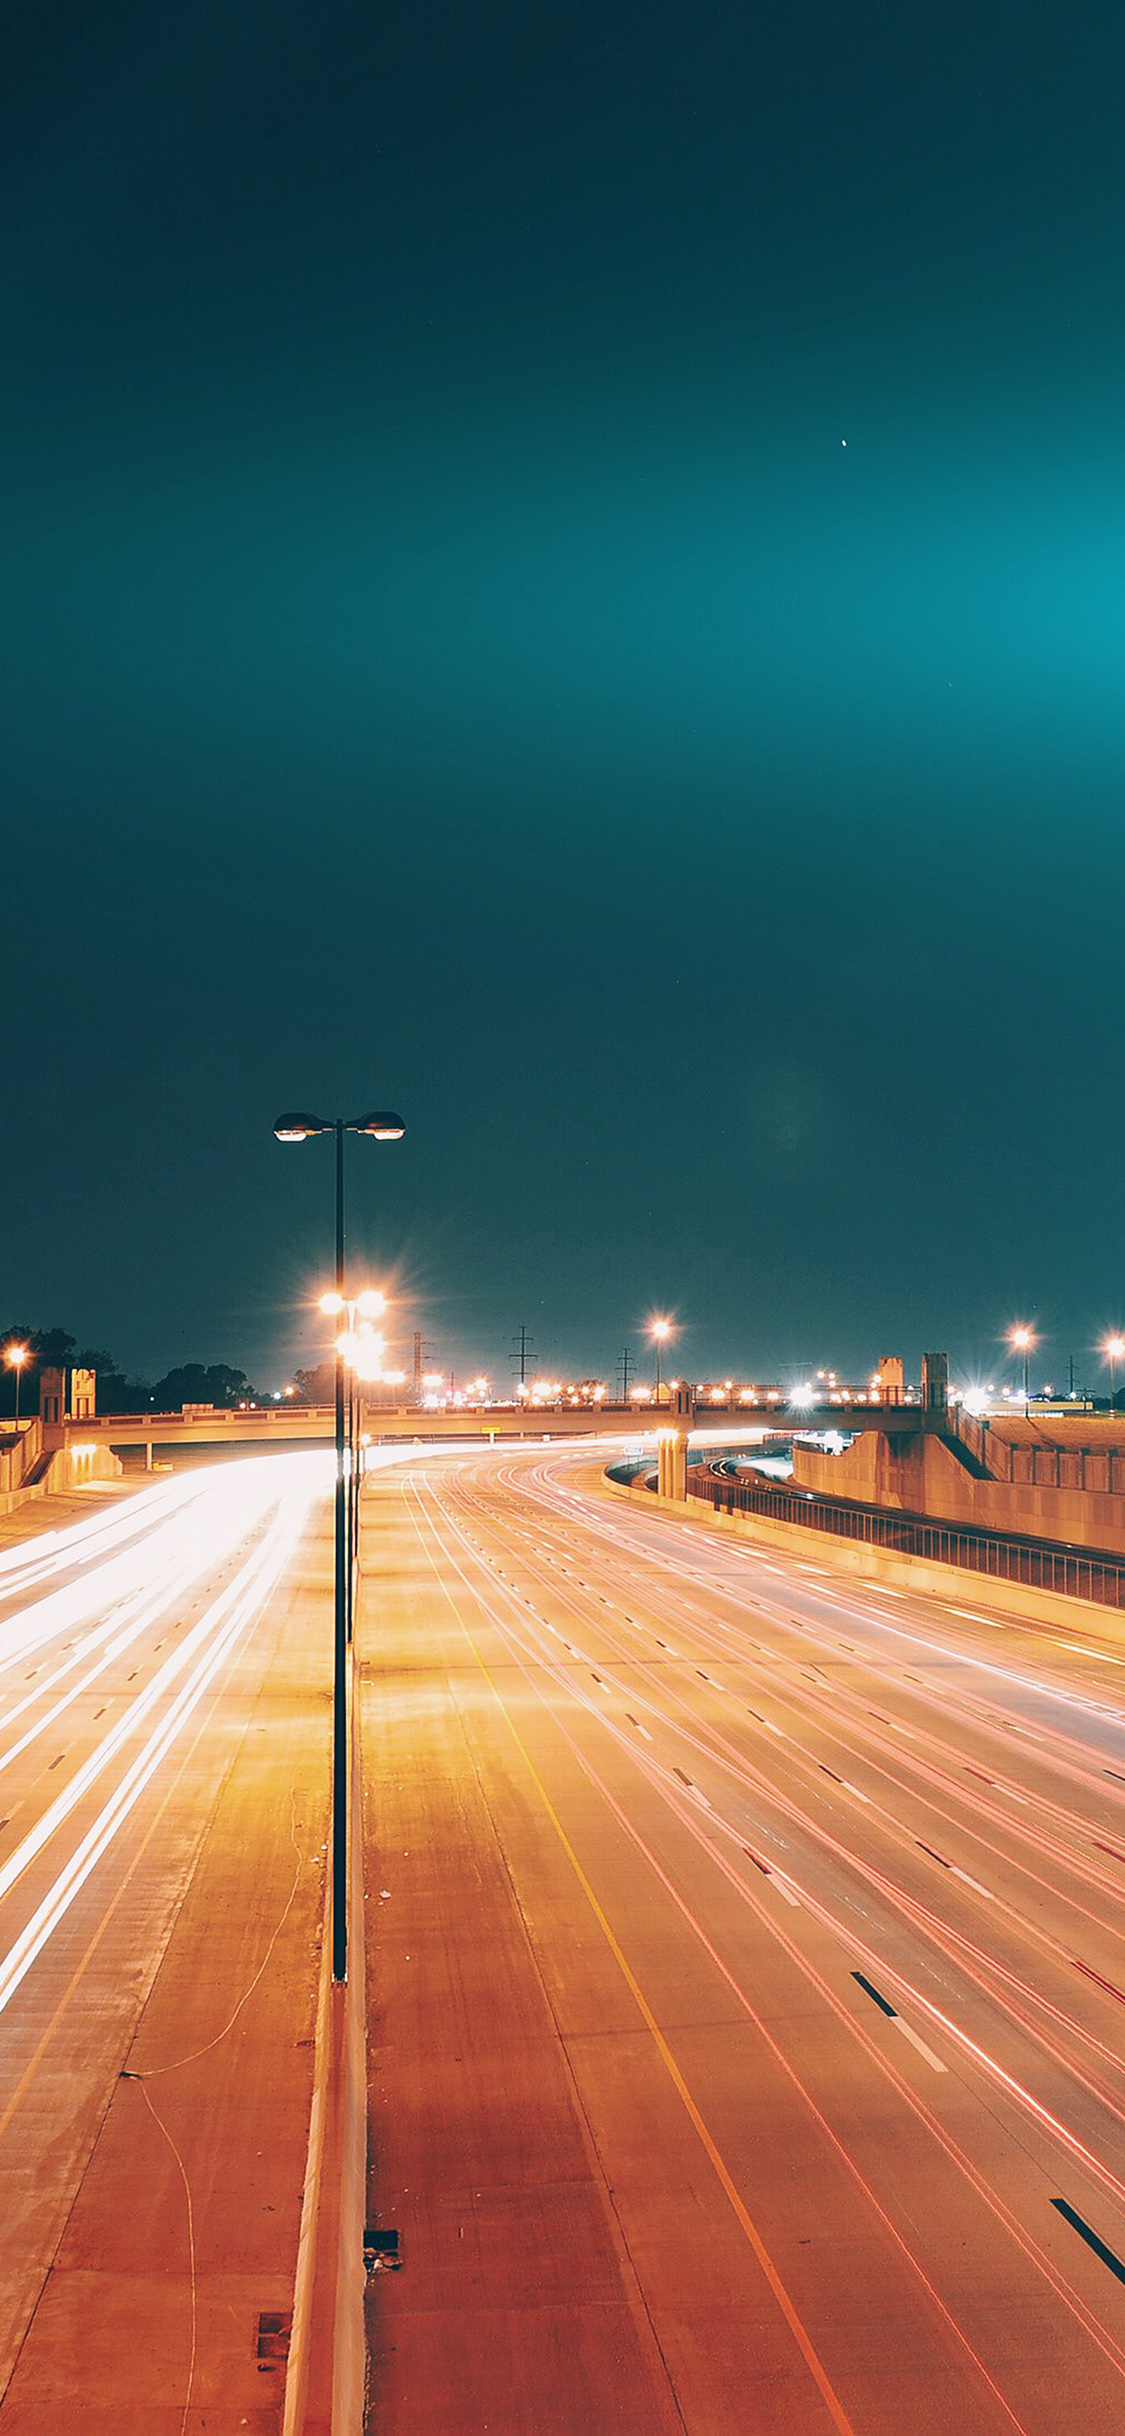 iPhoneXpapers.com-Apple-iPhone-wallpaper-mv60-road-street-city-night-car-lights-blue-flare